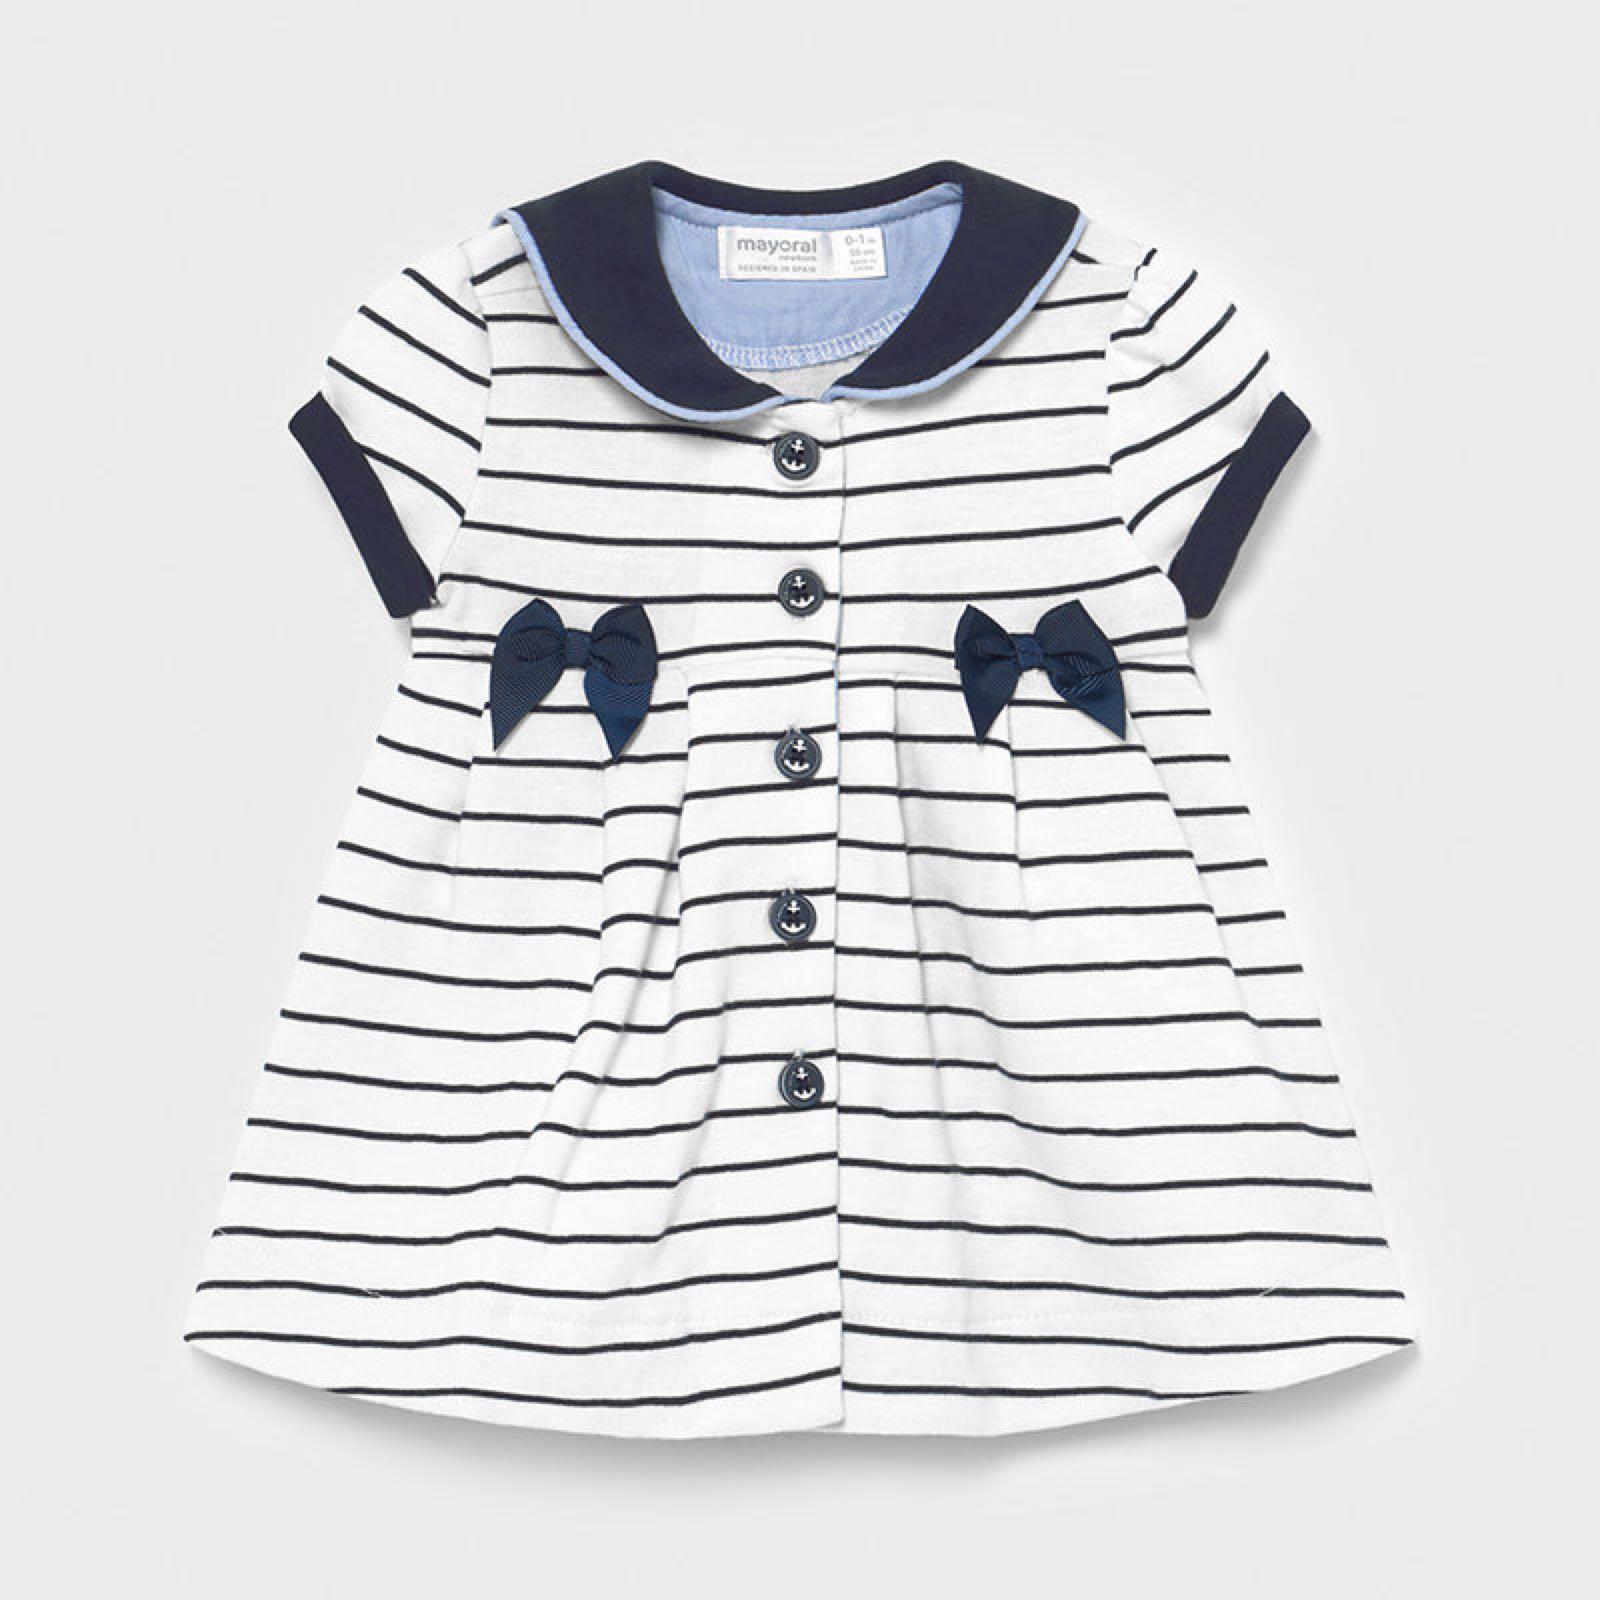 MAYORAL BABY GIRL Sailor Dress 1801-039